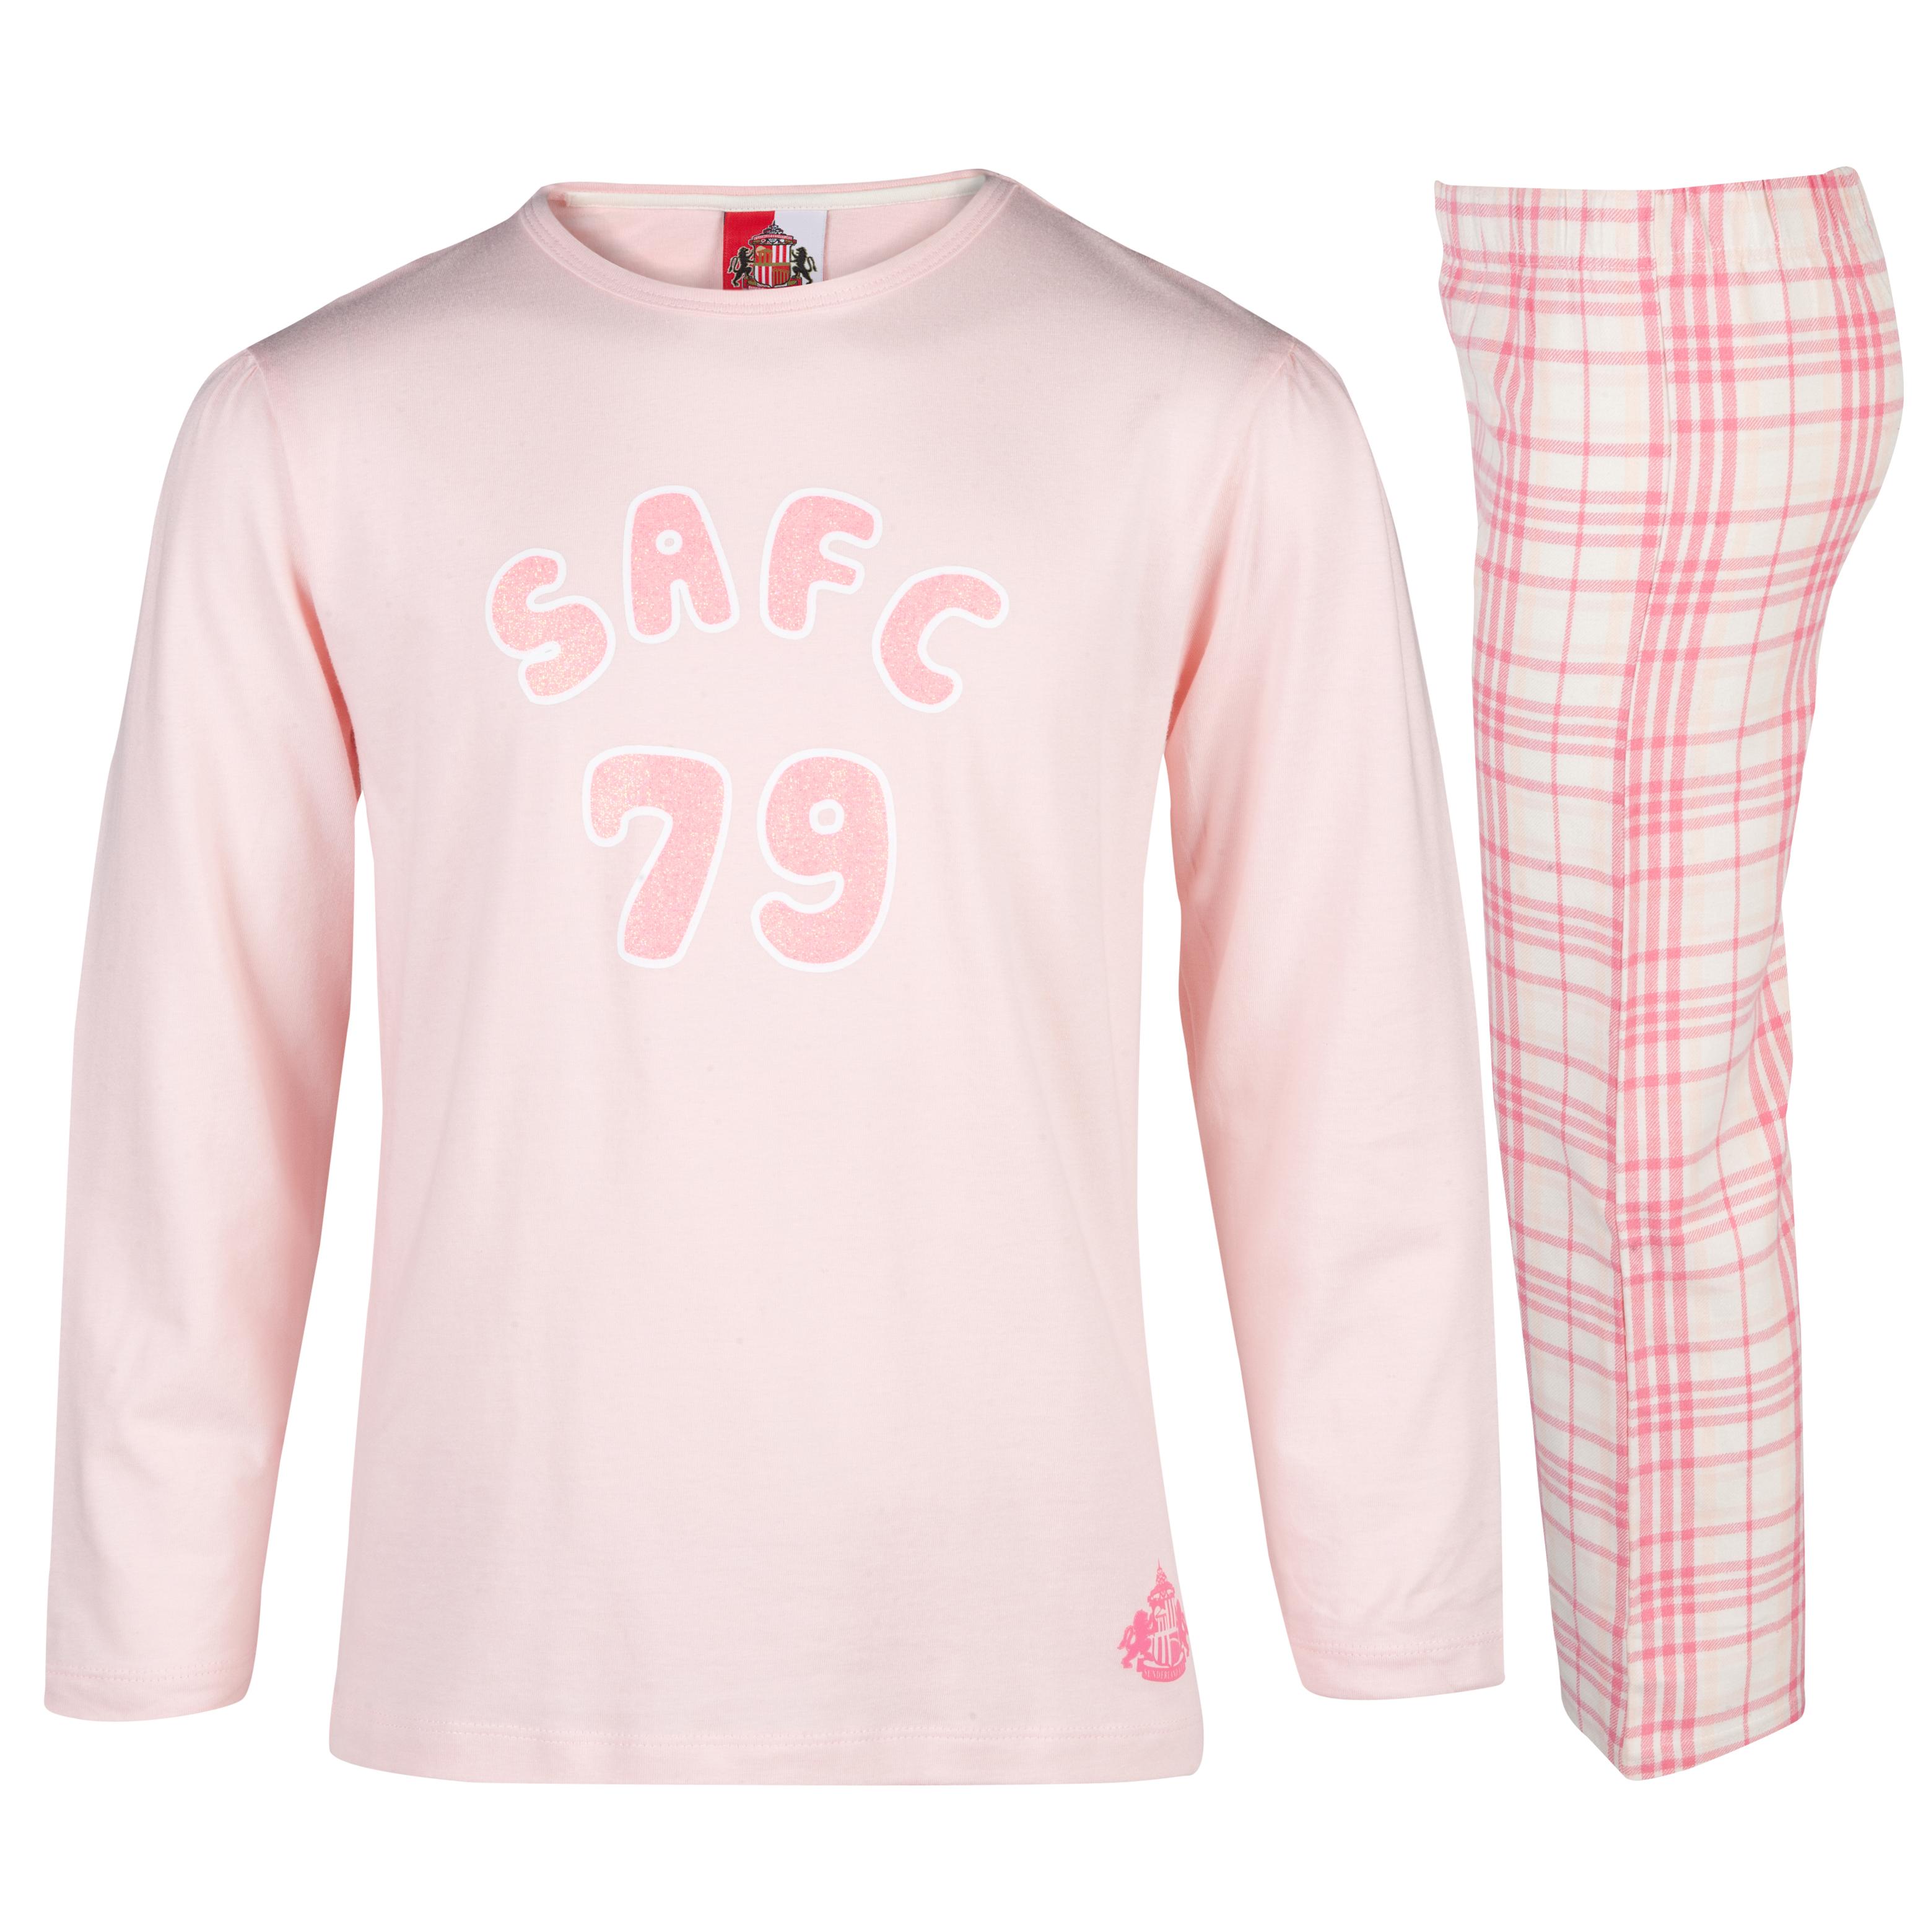 Sunderland 79 Pyjamas Girls Pink